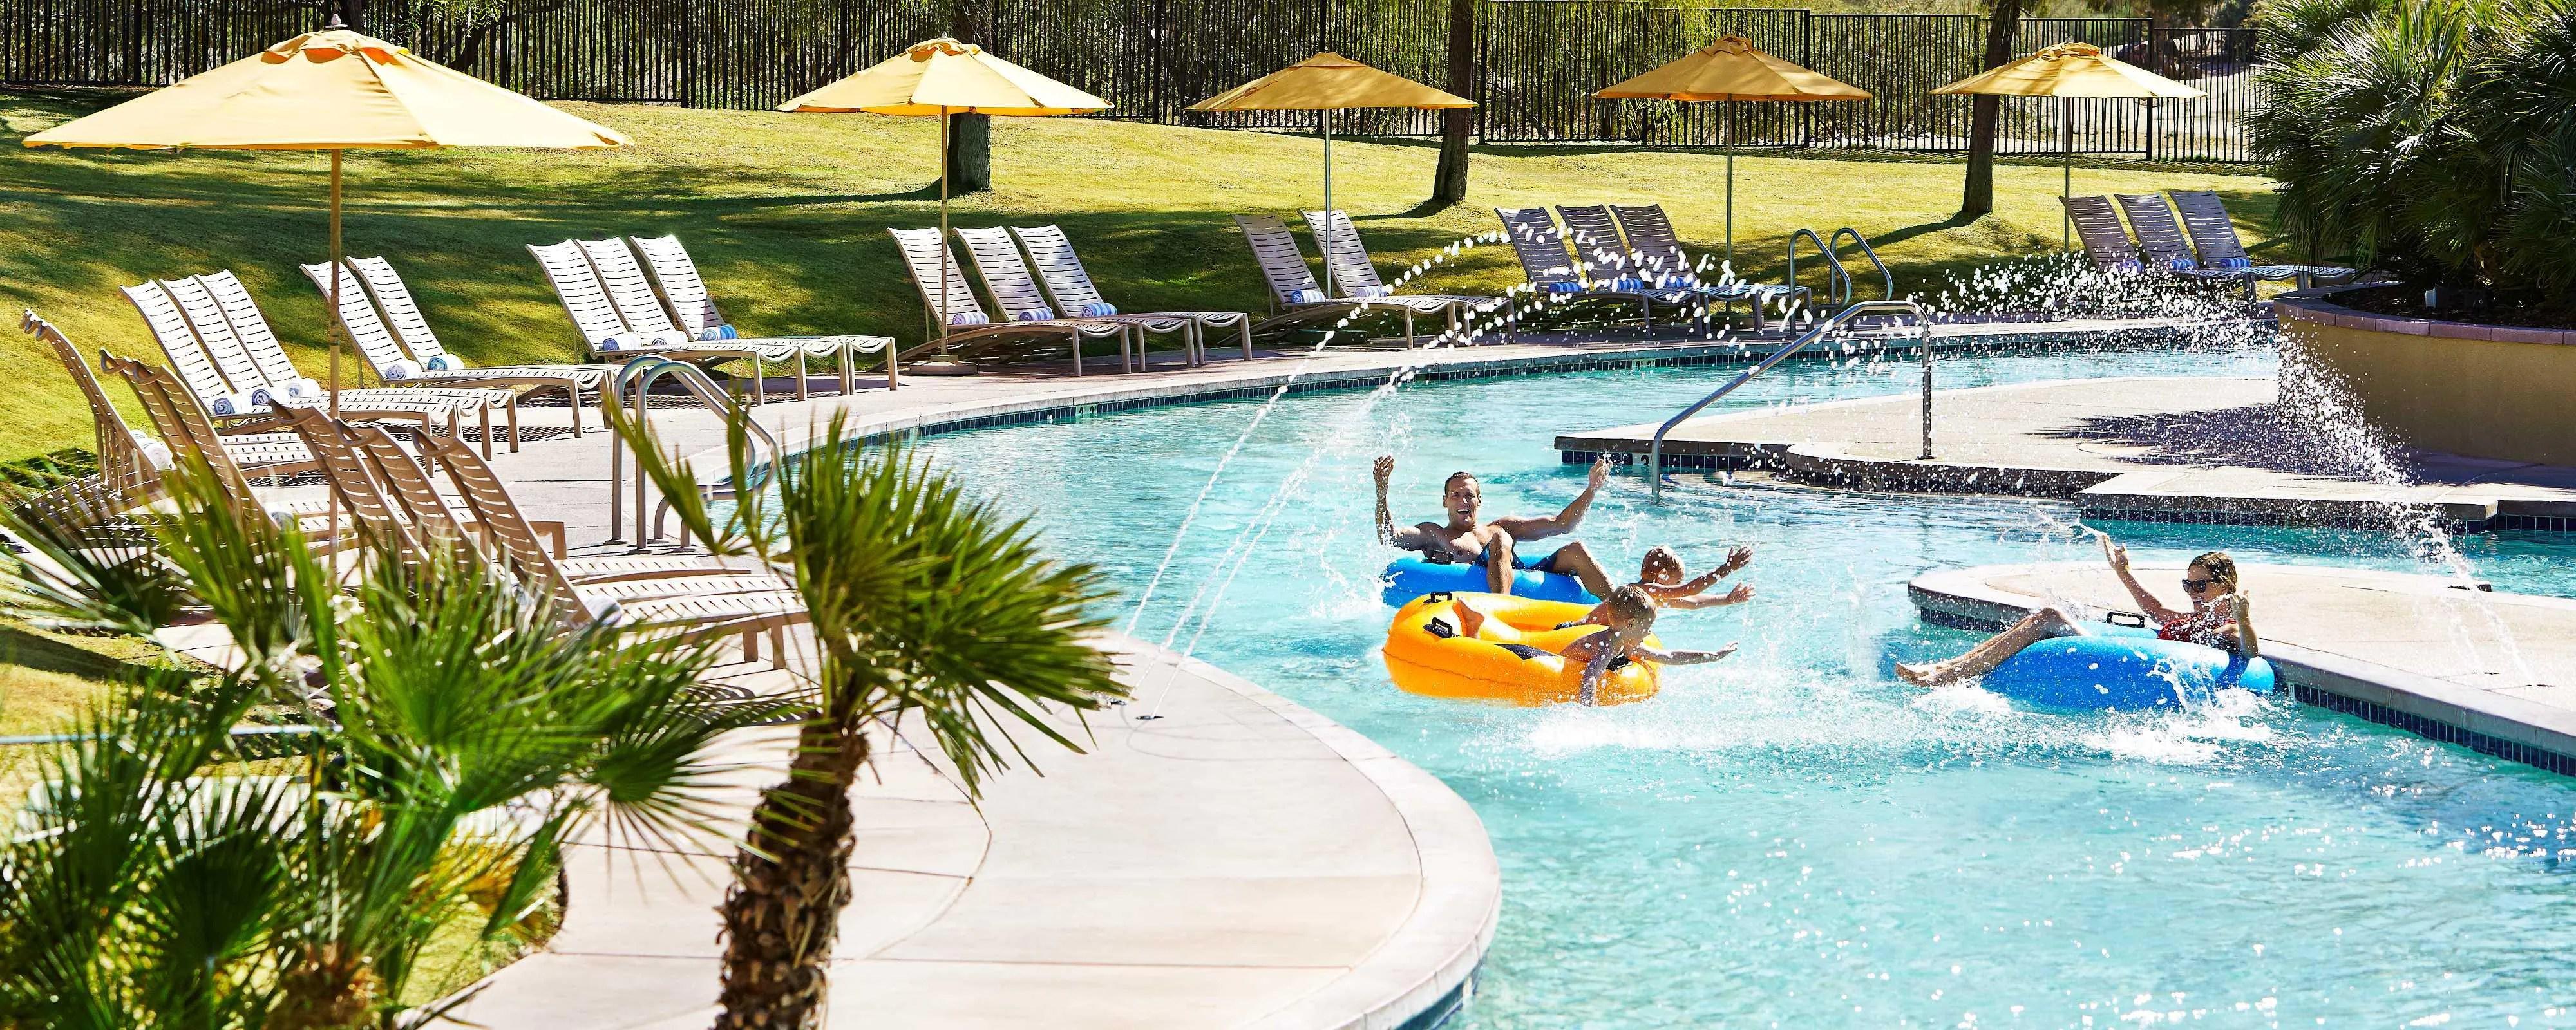 Lazy River Phoenix  JW Marriott Phoenix Resorts And Spas